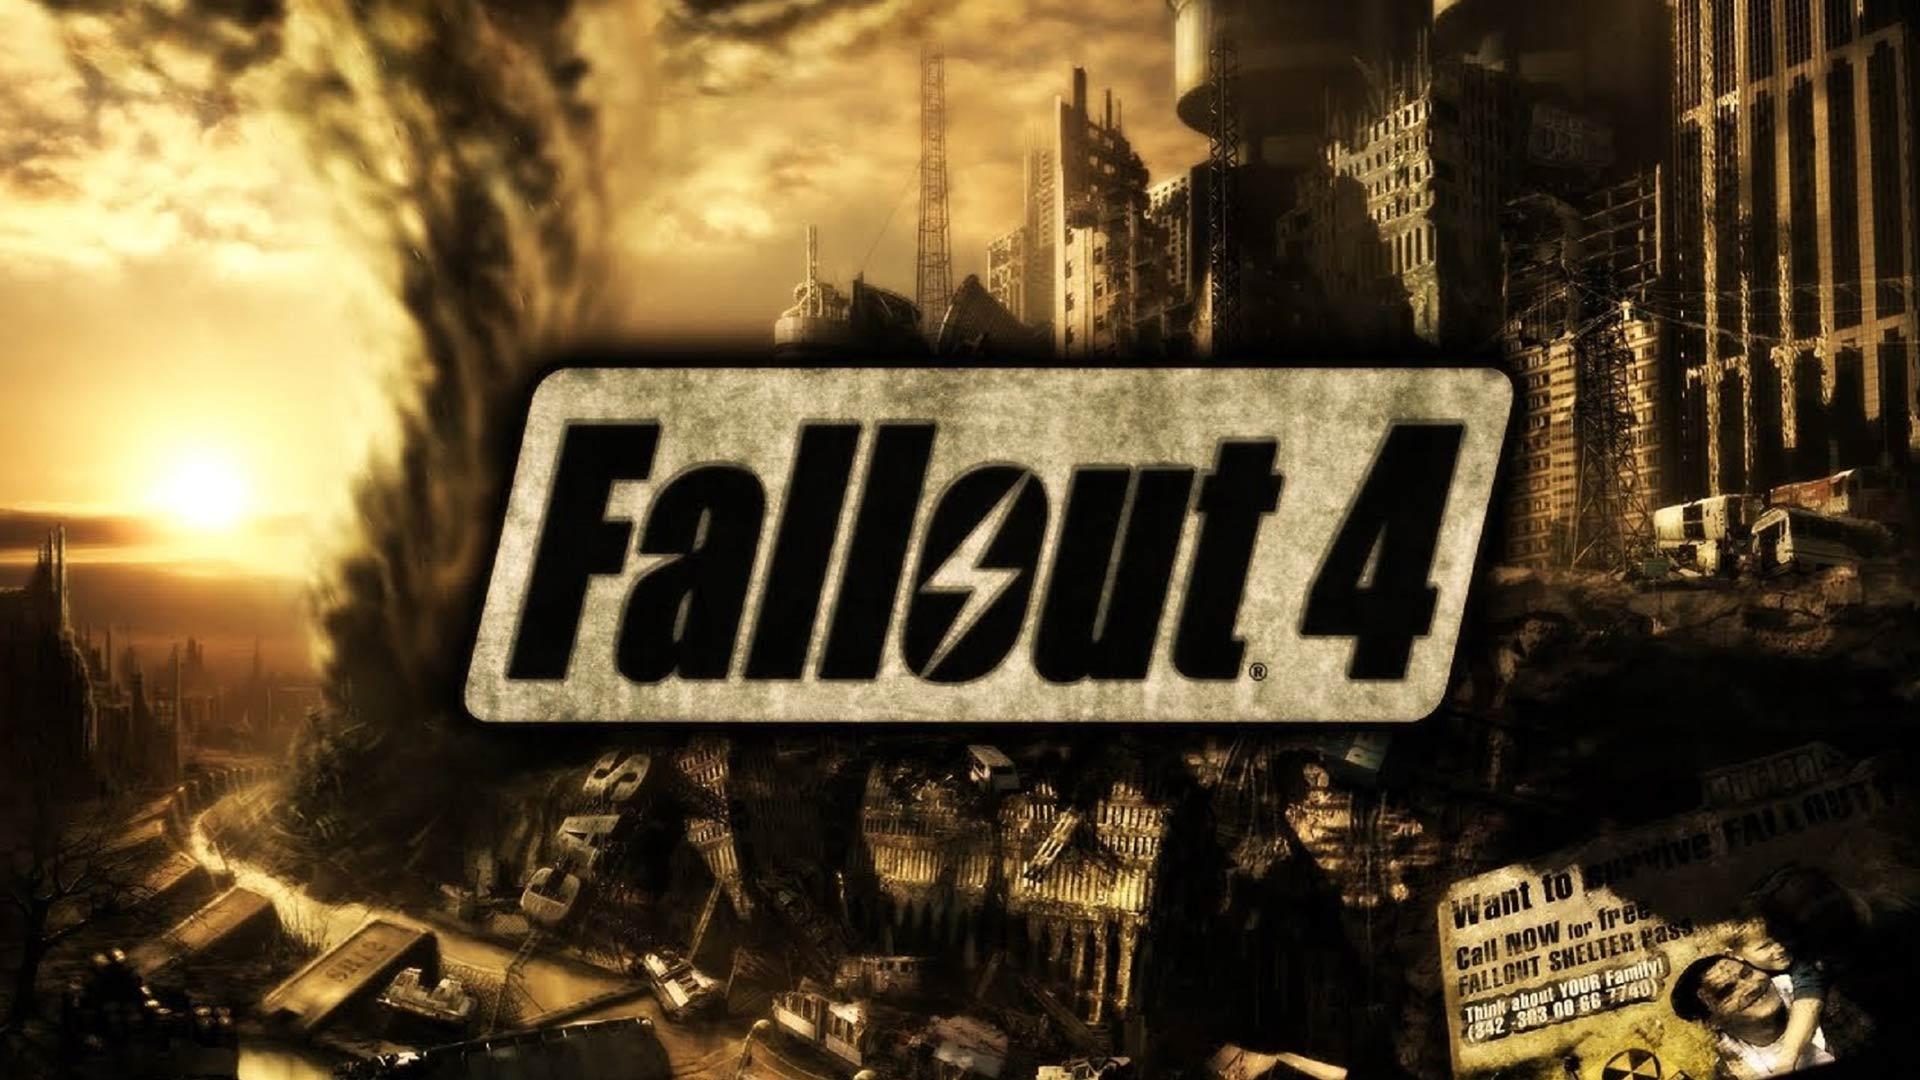 Fallout 4 Wallpaper   wallpaper 1920x1080